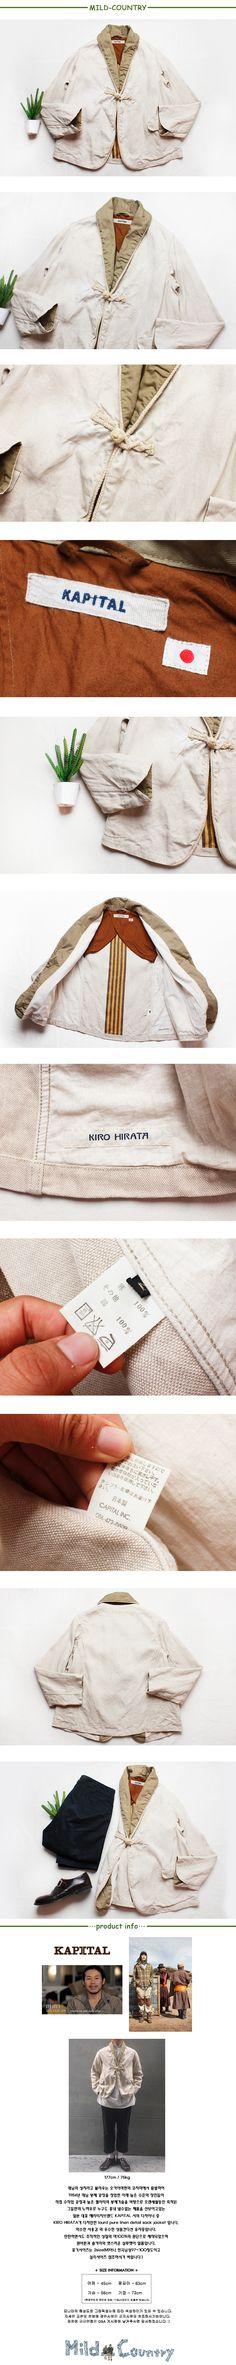 Kapital by KIRO HIRATA lourd pure linen detail jacket(made in Japan)